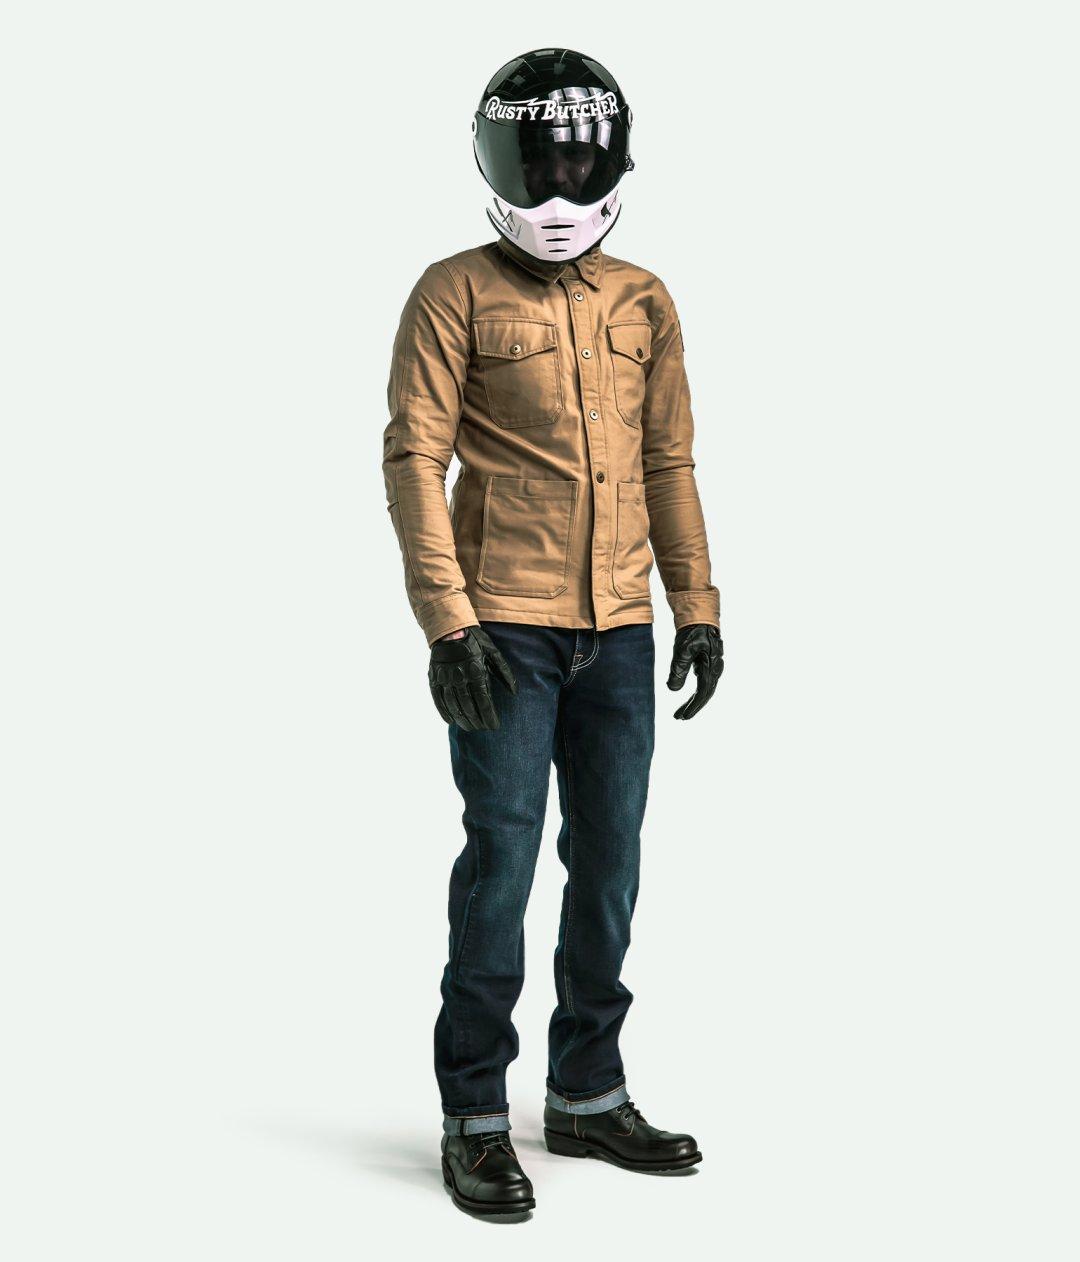 Best Cafe Racer Gear 2020 Vintage Helmets Jackets More Revzilla Revzilla